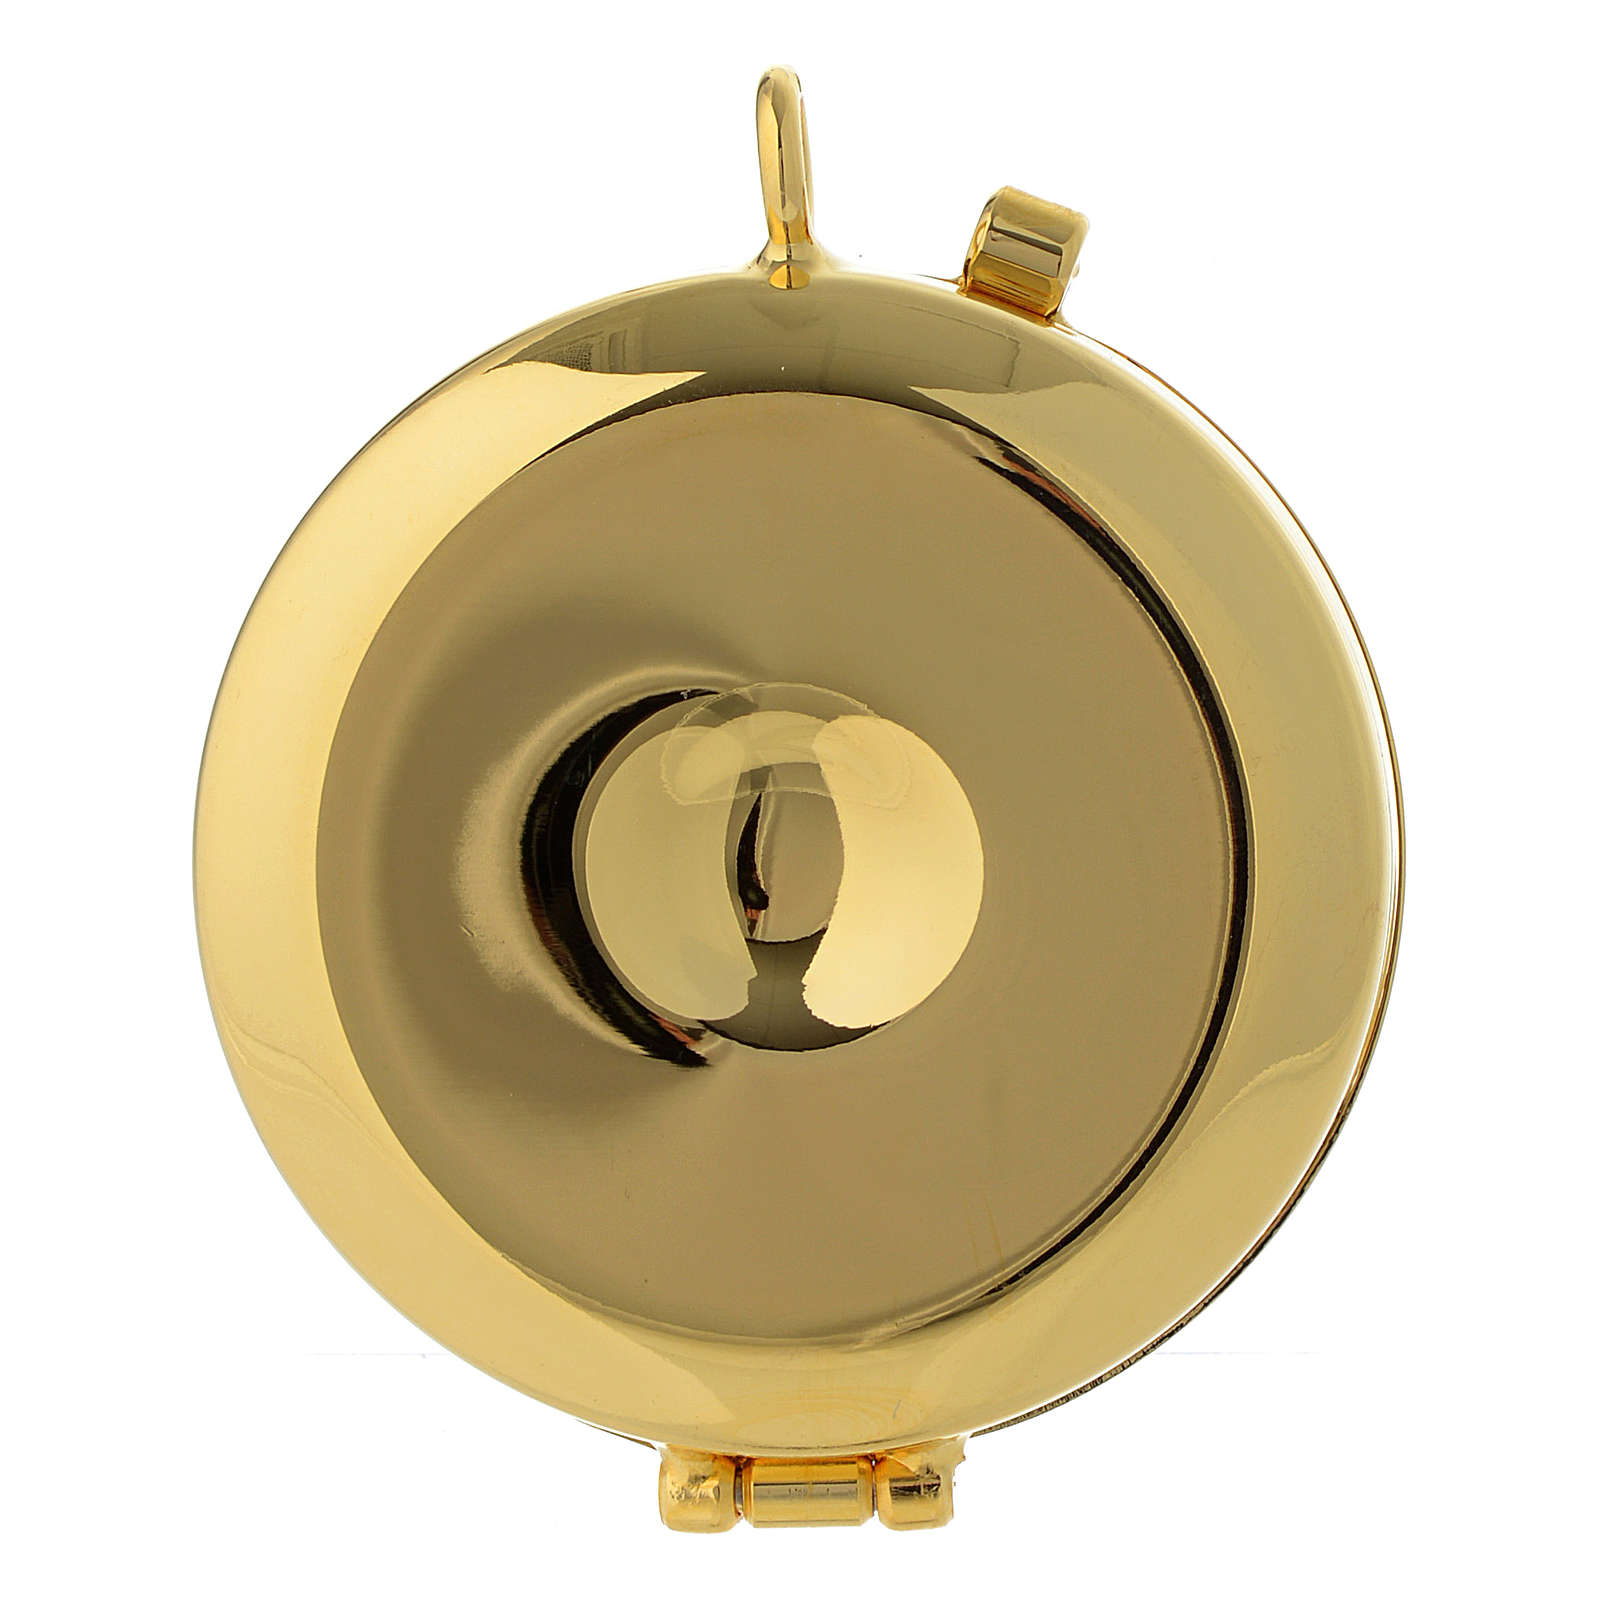 Teca porta Ostie Ultima Cena metallo disco ulivo inciso diam. 5,5 cm 3